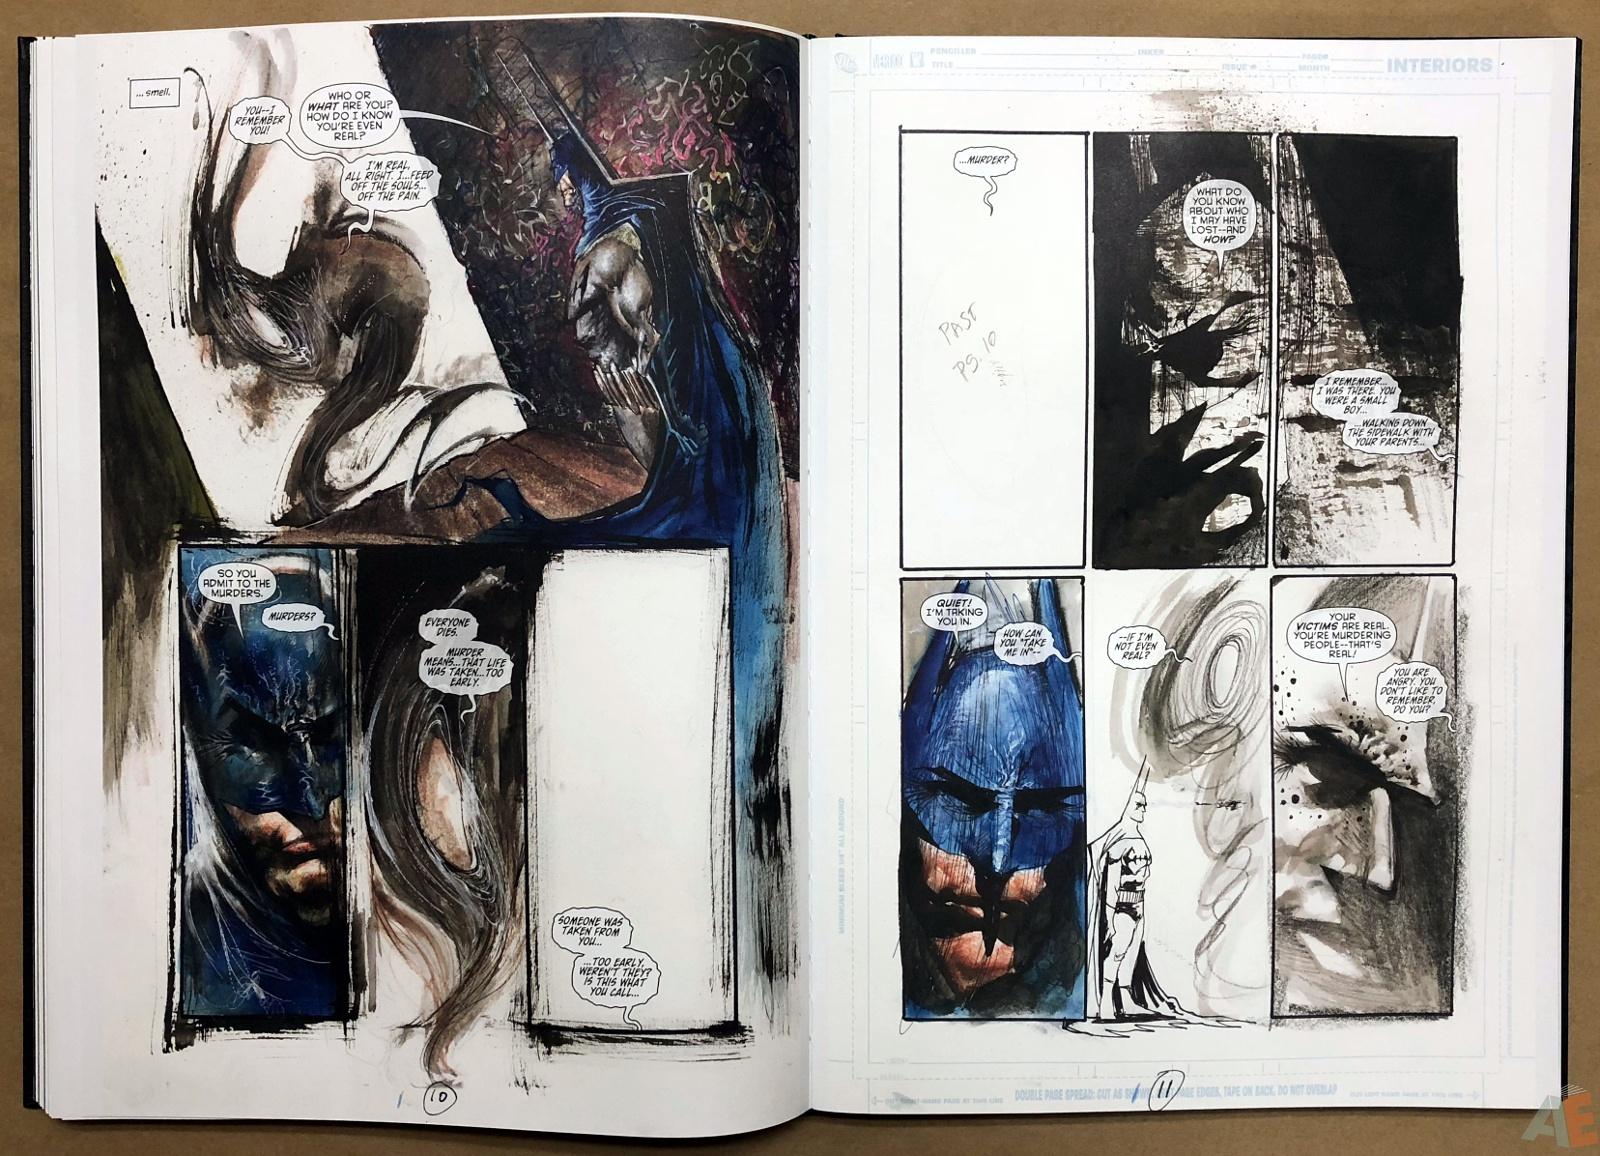 Batman: Secrets – Sam Kieth Gallery Edition 33